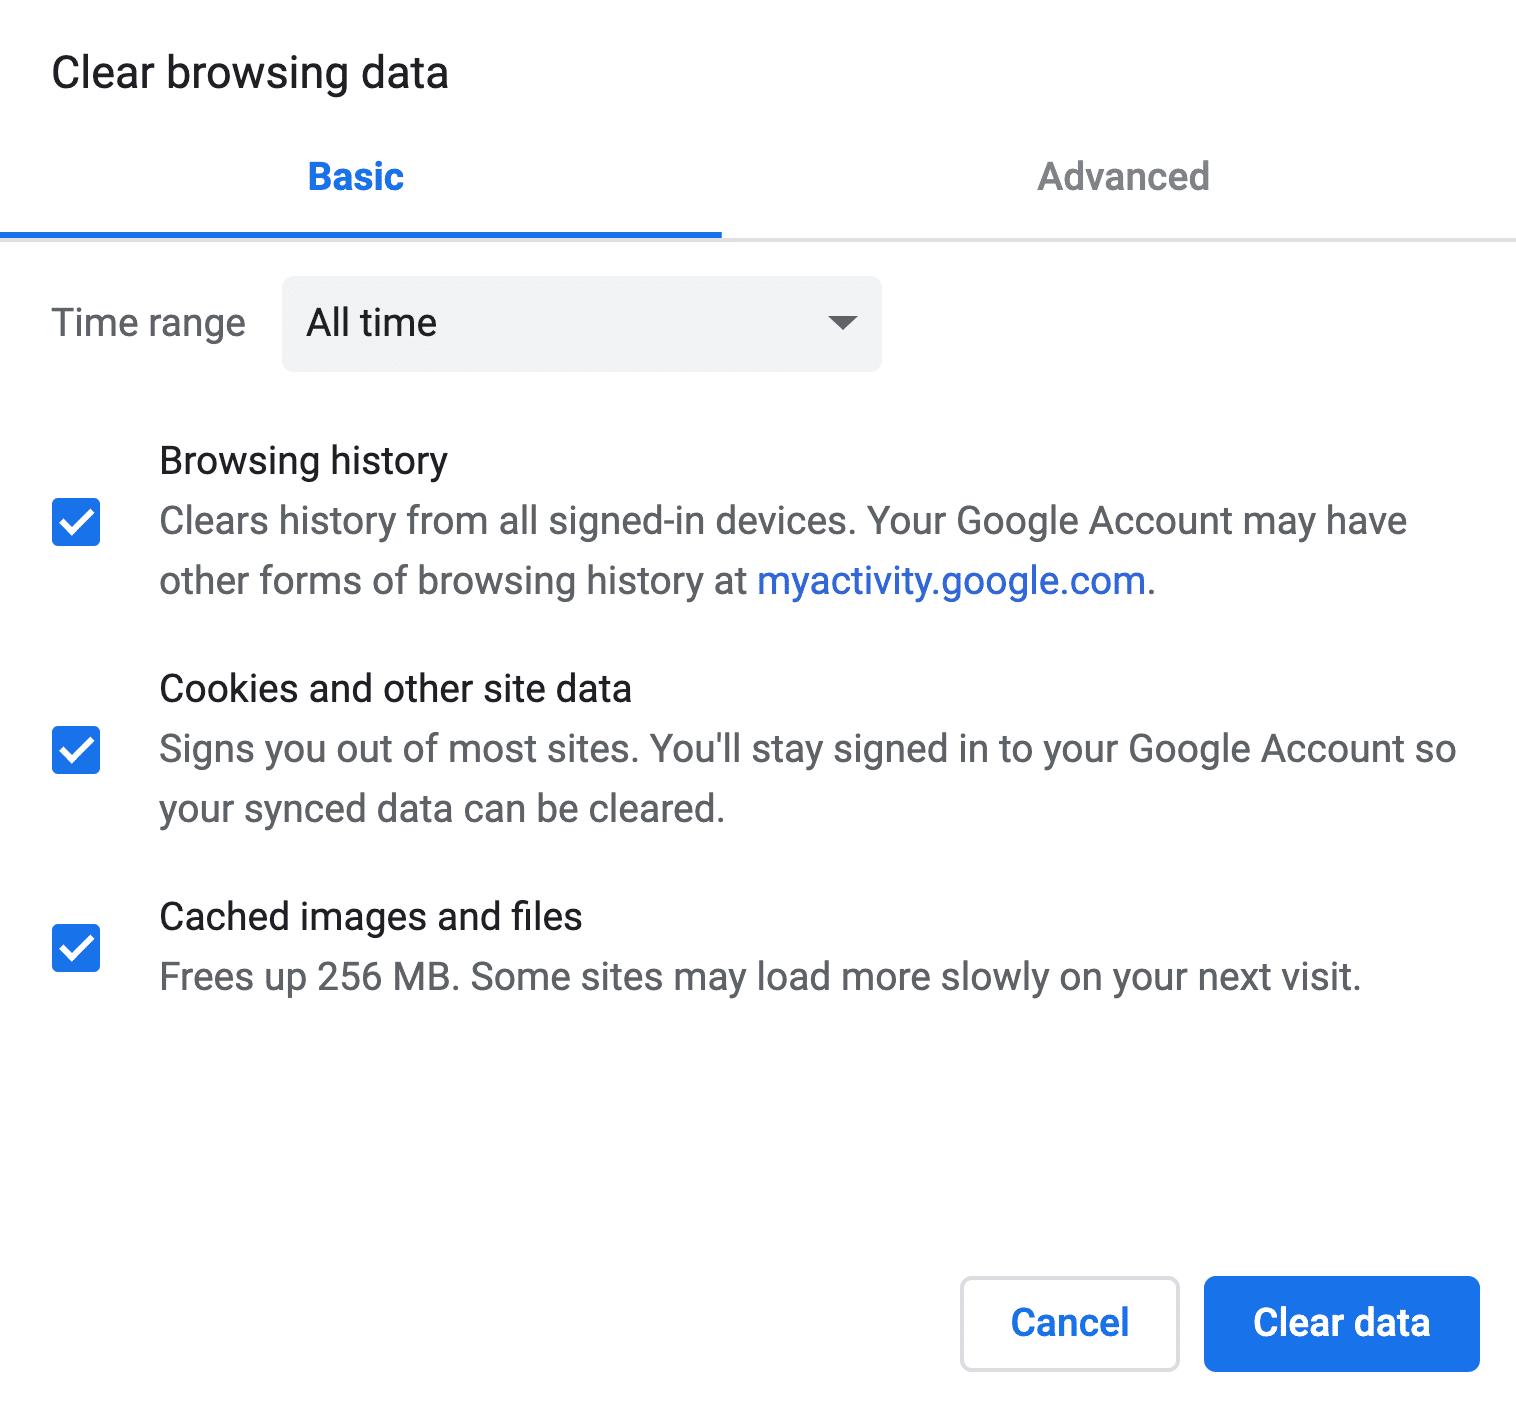 Slet browserdata